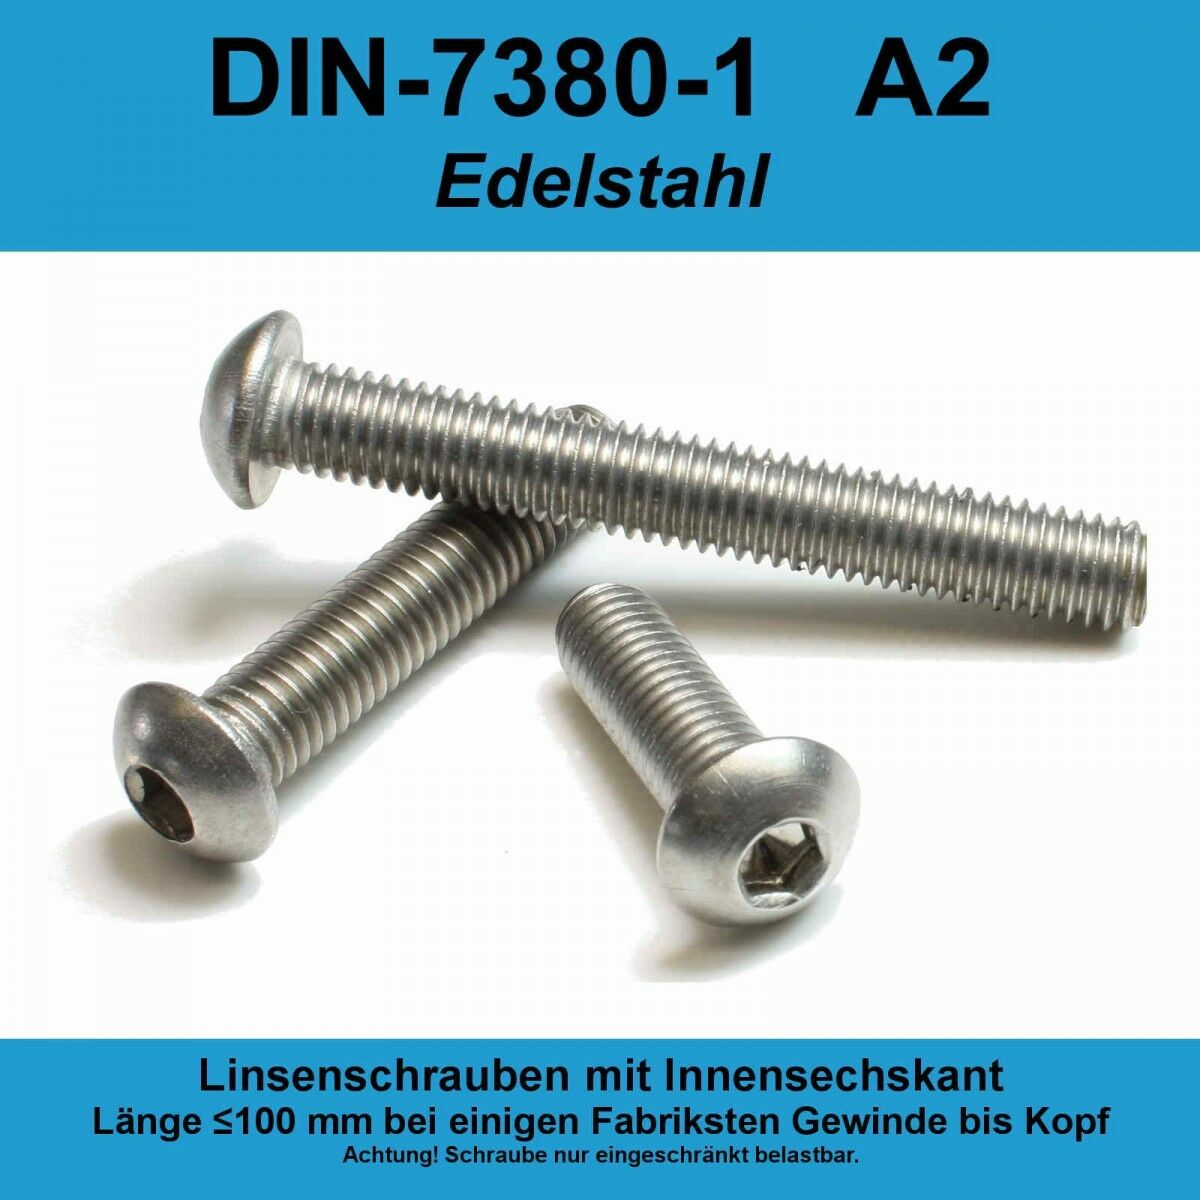 M6 ISO 7380-1 A2 V2A Edelstahl Linsenschrauben Innensechskant Linsenkopf M6x